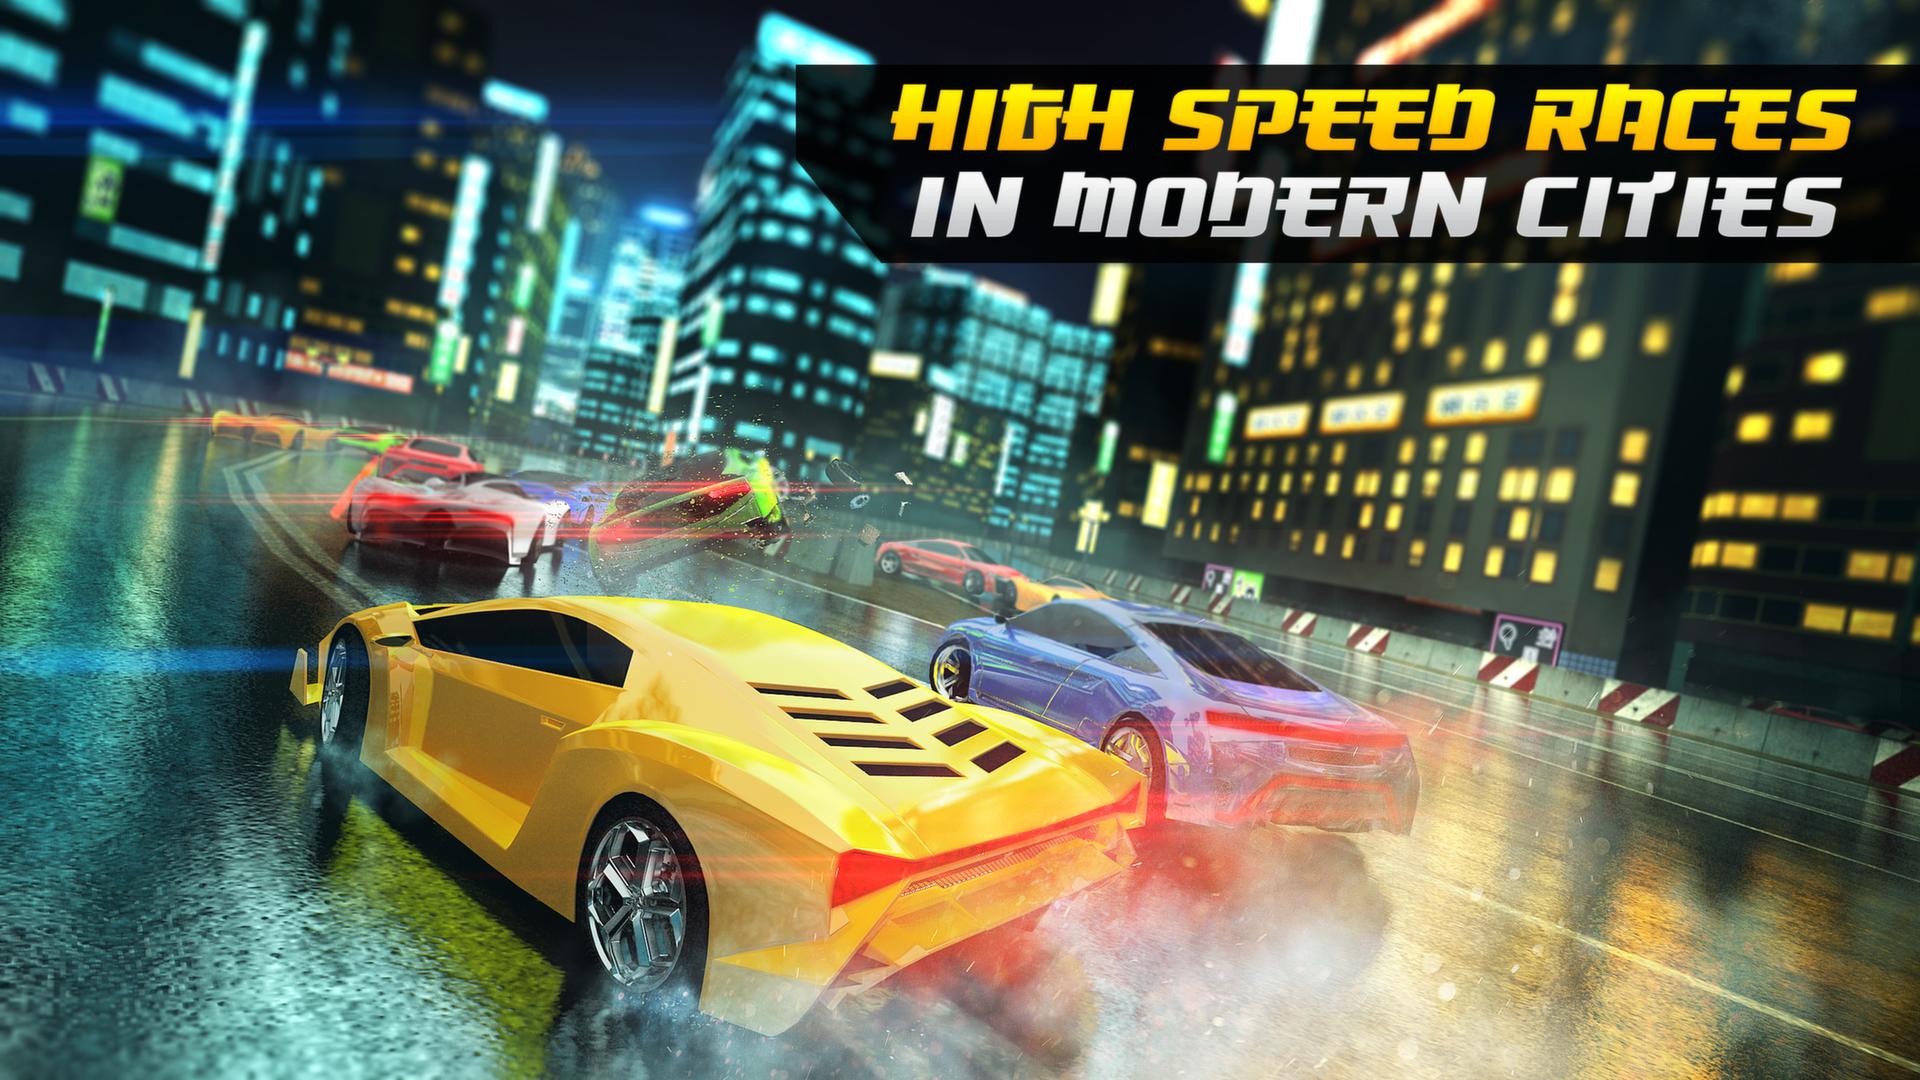 High Speed Race: Need for Asphalt Racing